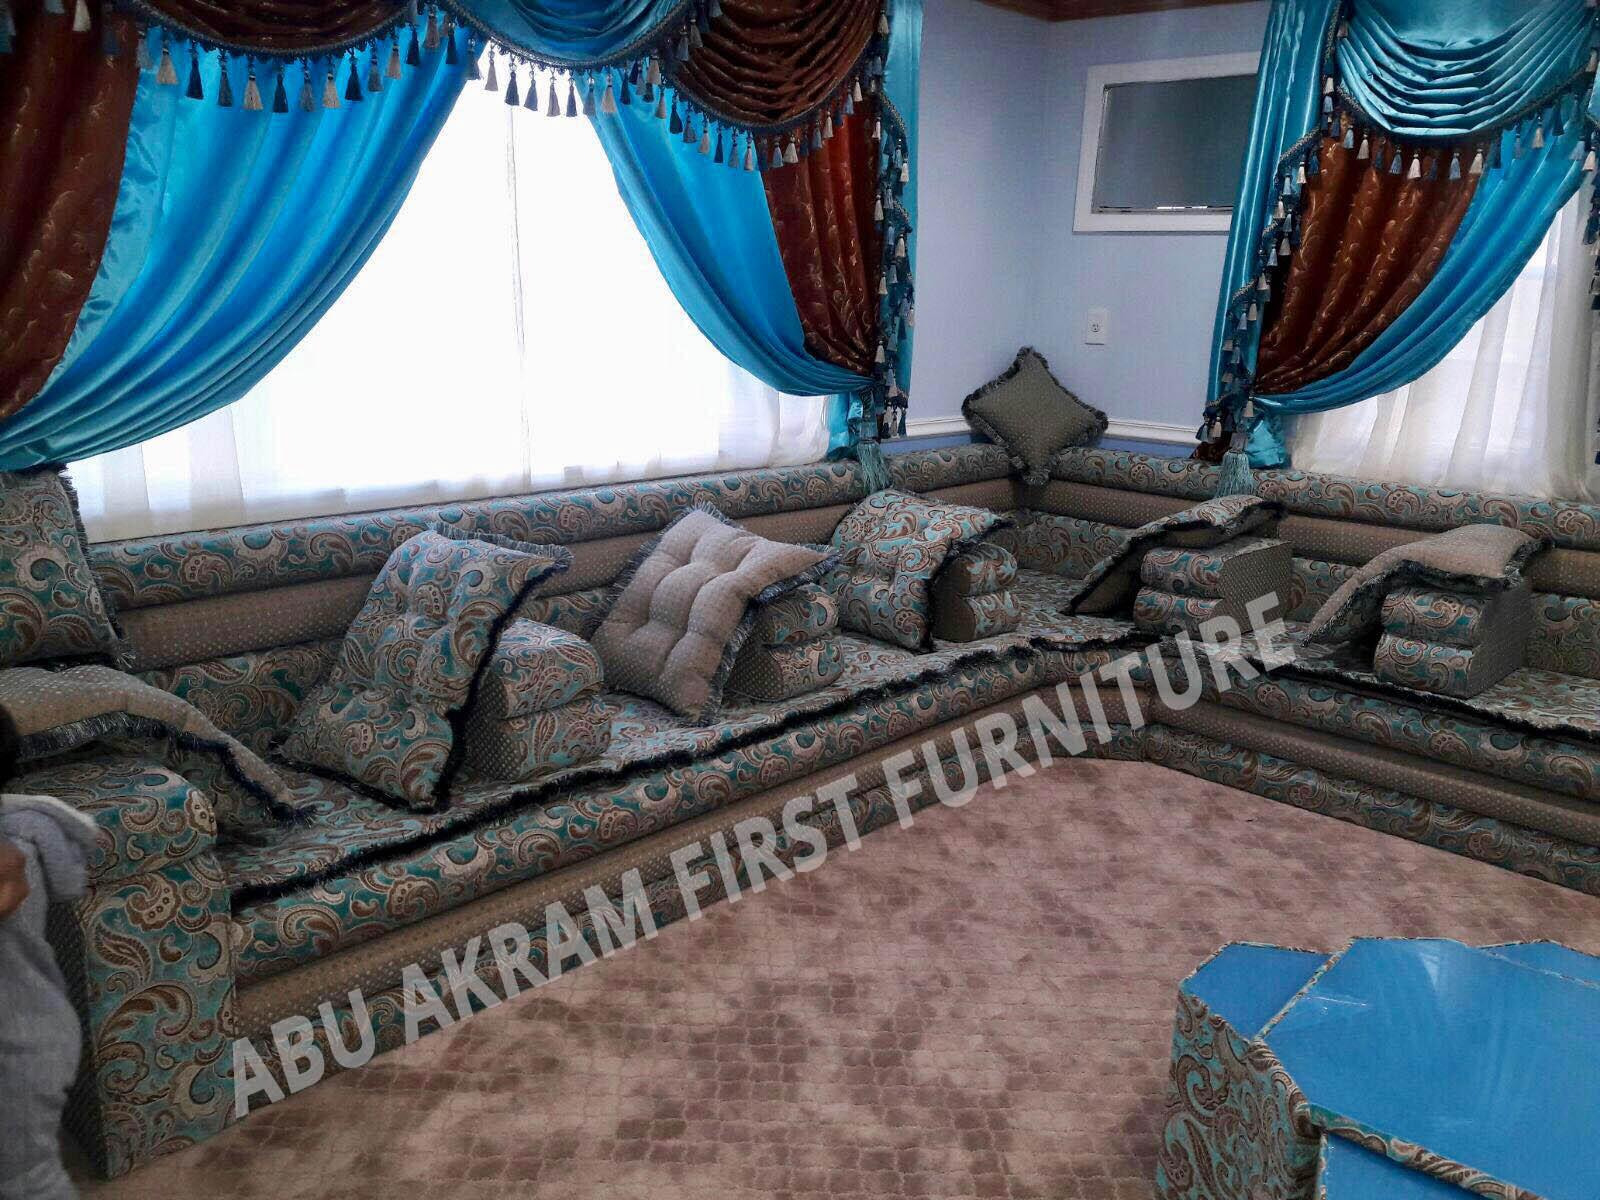 Abu Akram First Furniture